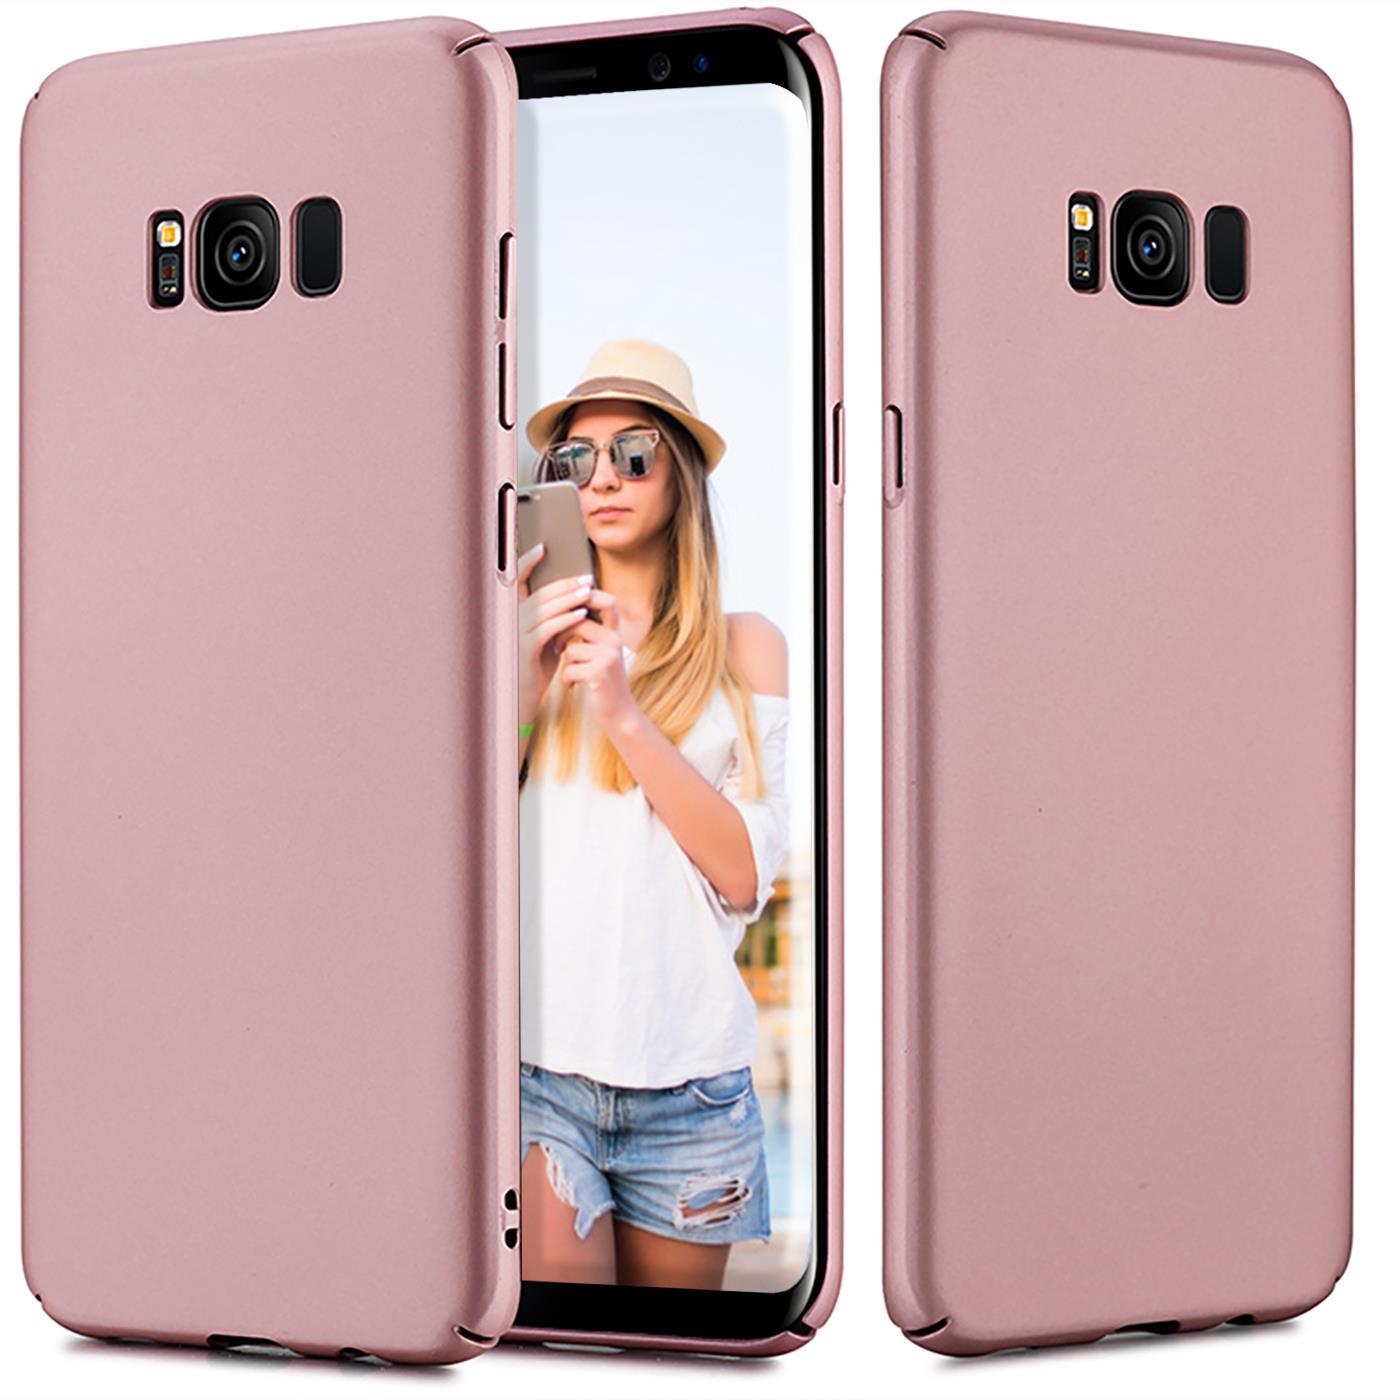 Hard-Back-Case-Cover-Samsung-Galaxy-s4-duenn-Cover-Slim-Shockproof-Rugged Indexbild 20